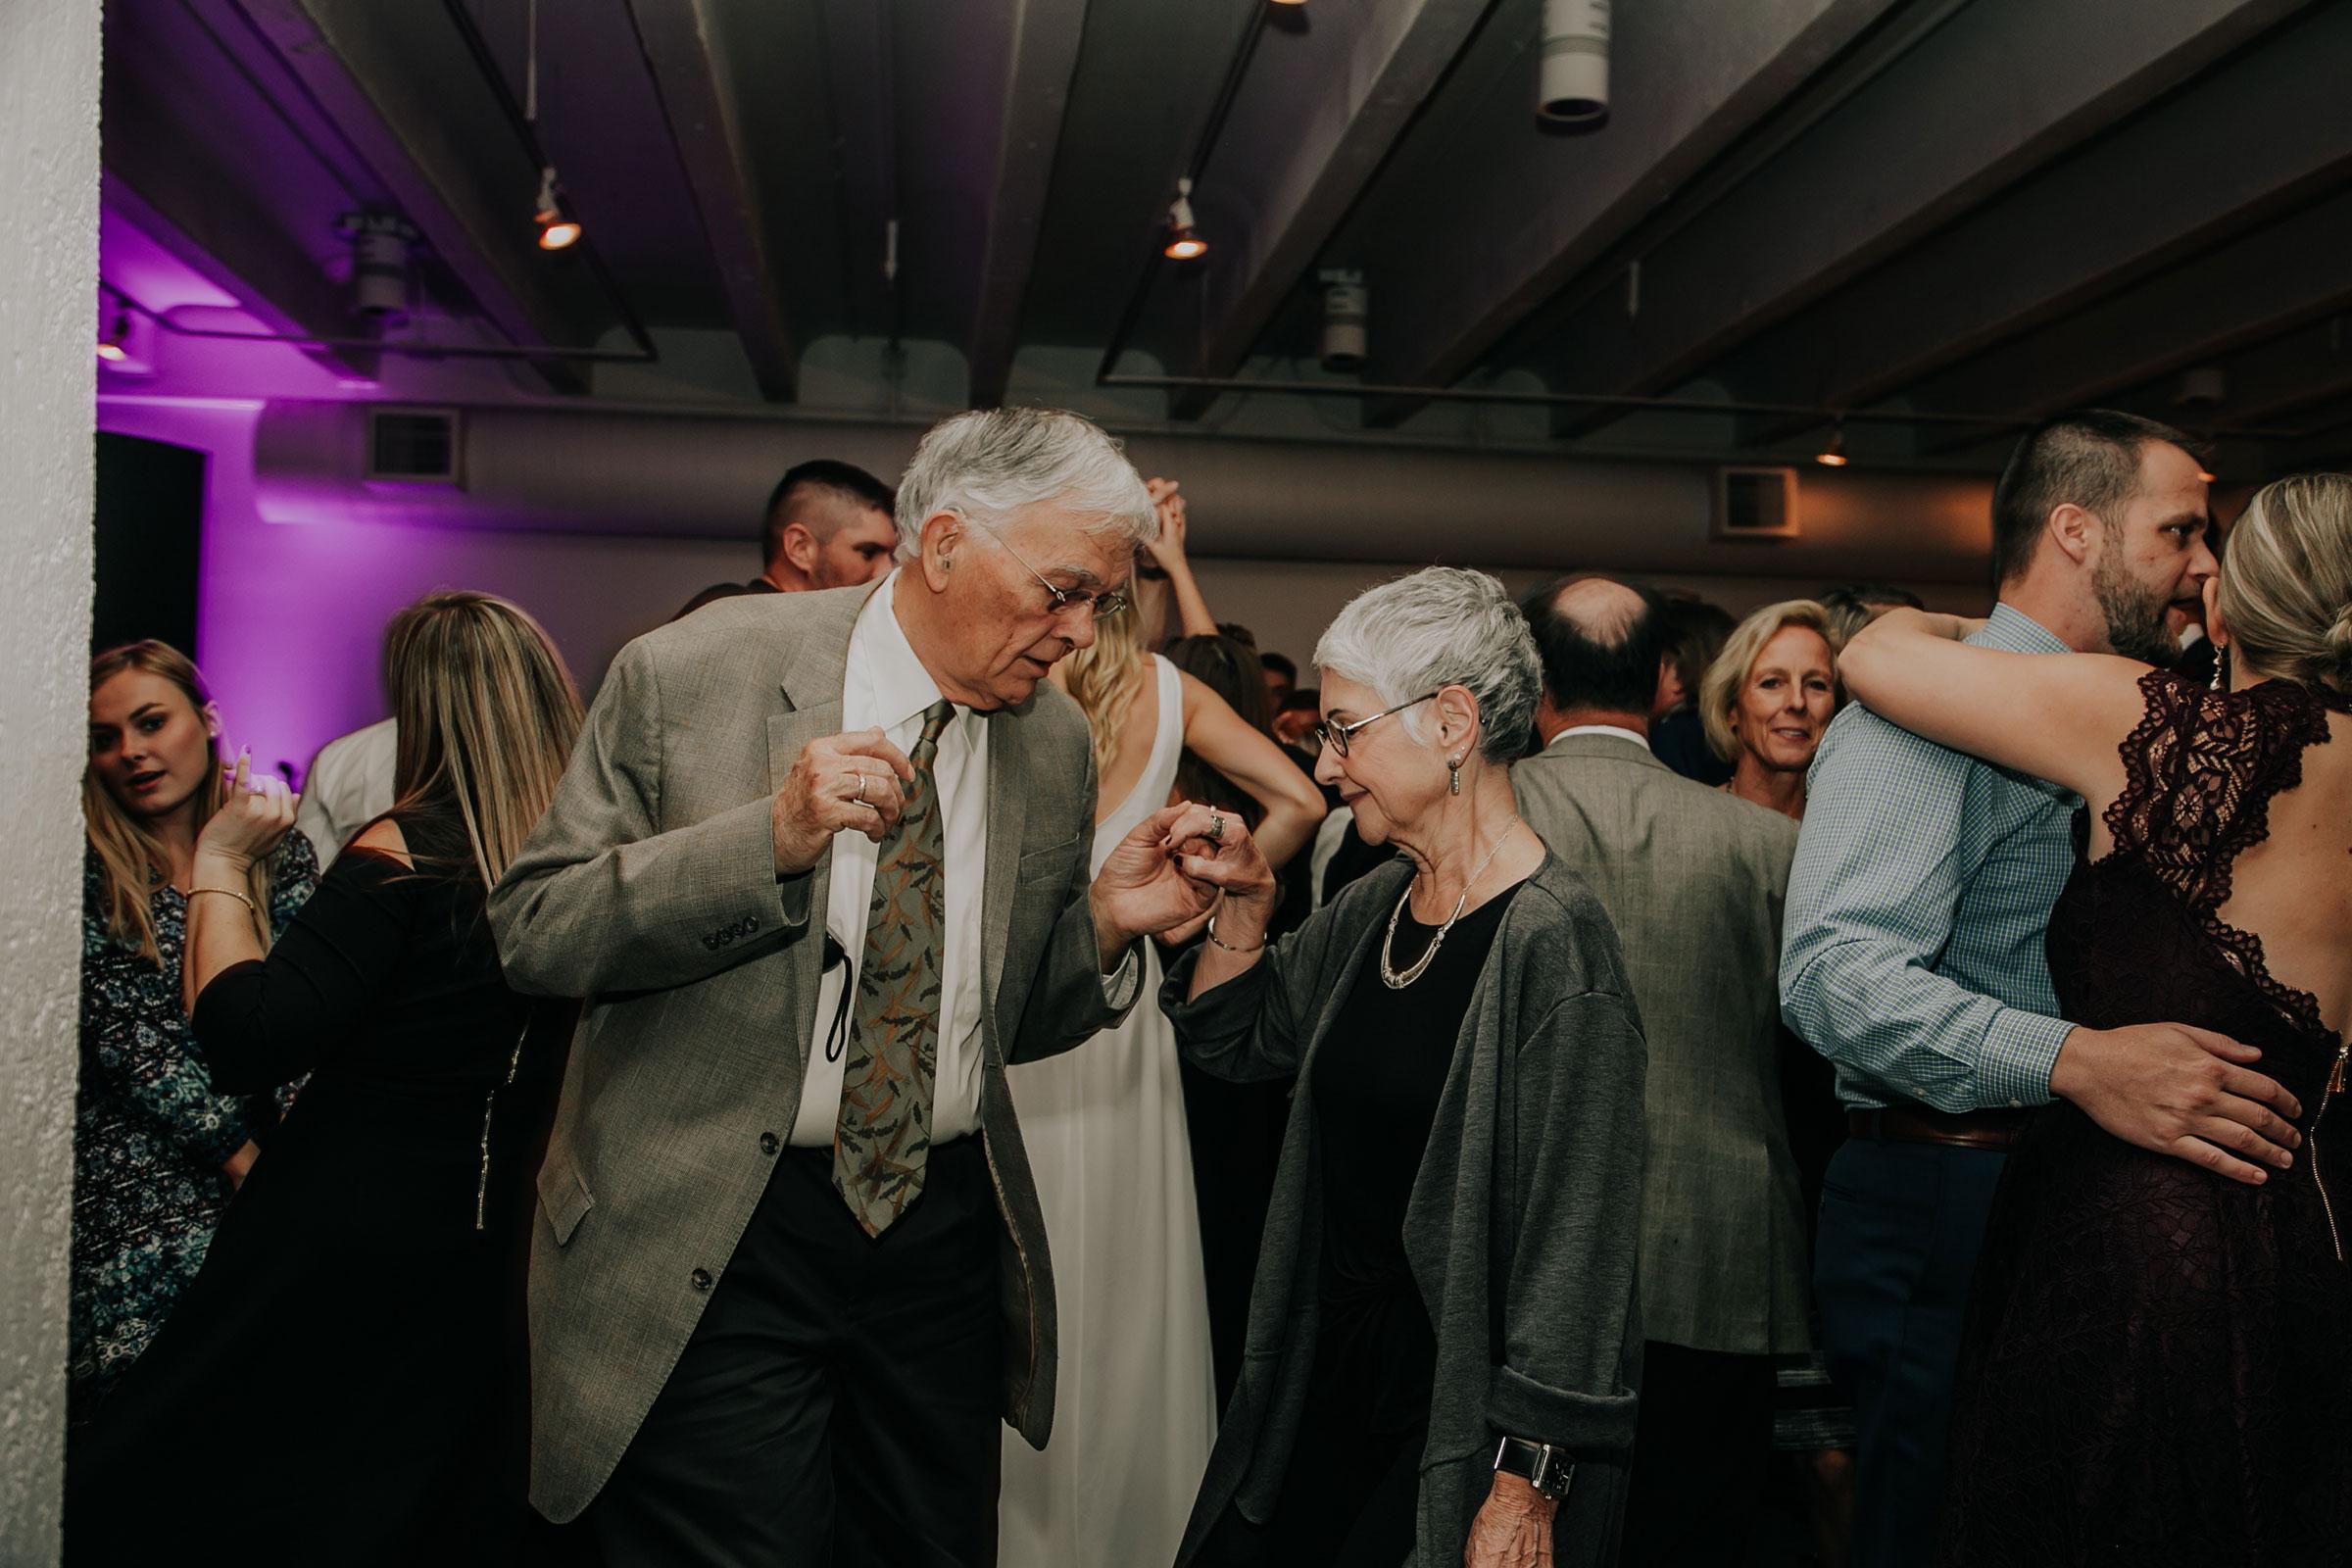 guests-dancing-at-reception-founders-one-nine-omaha-nebraska-raelyn-ramey-photography.jpg